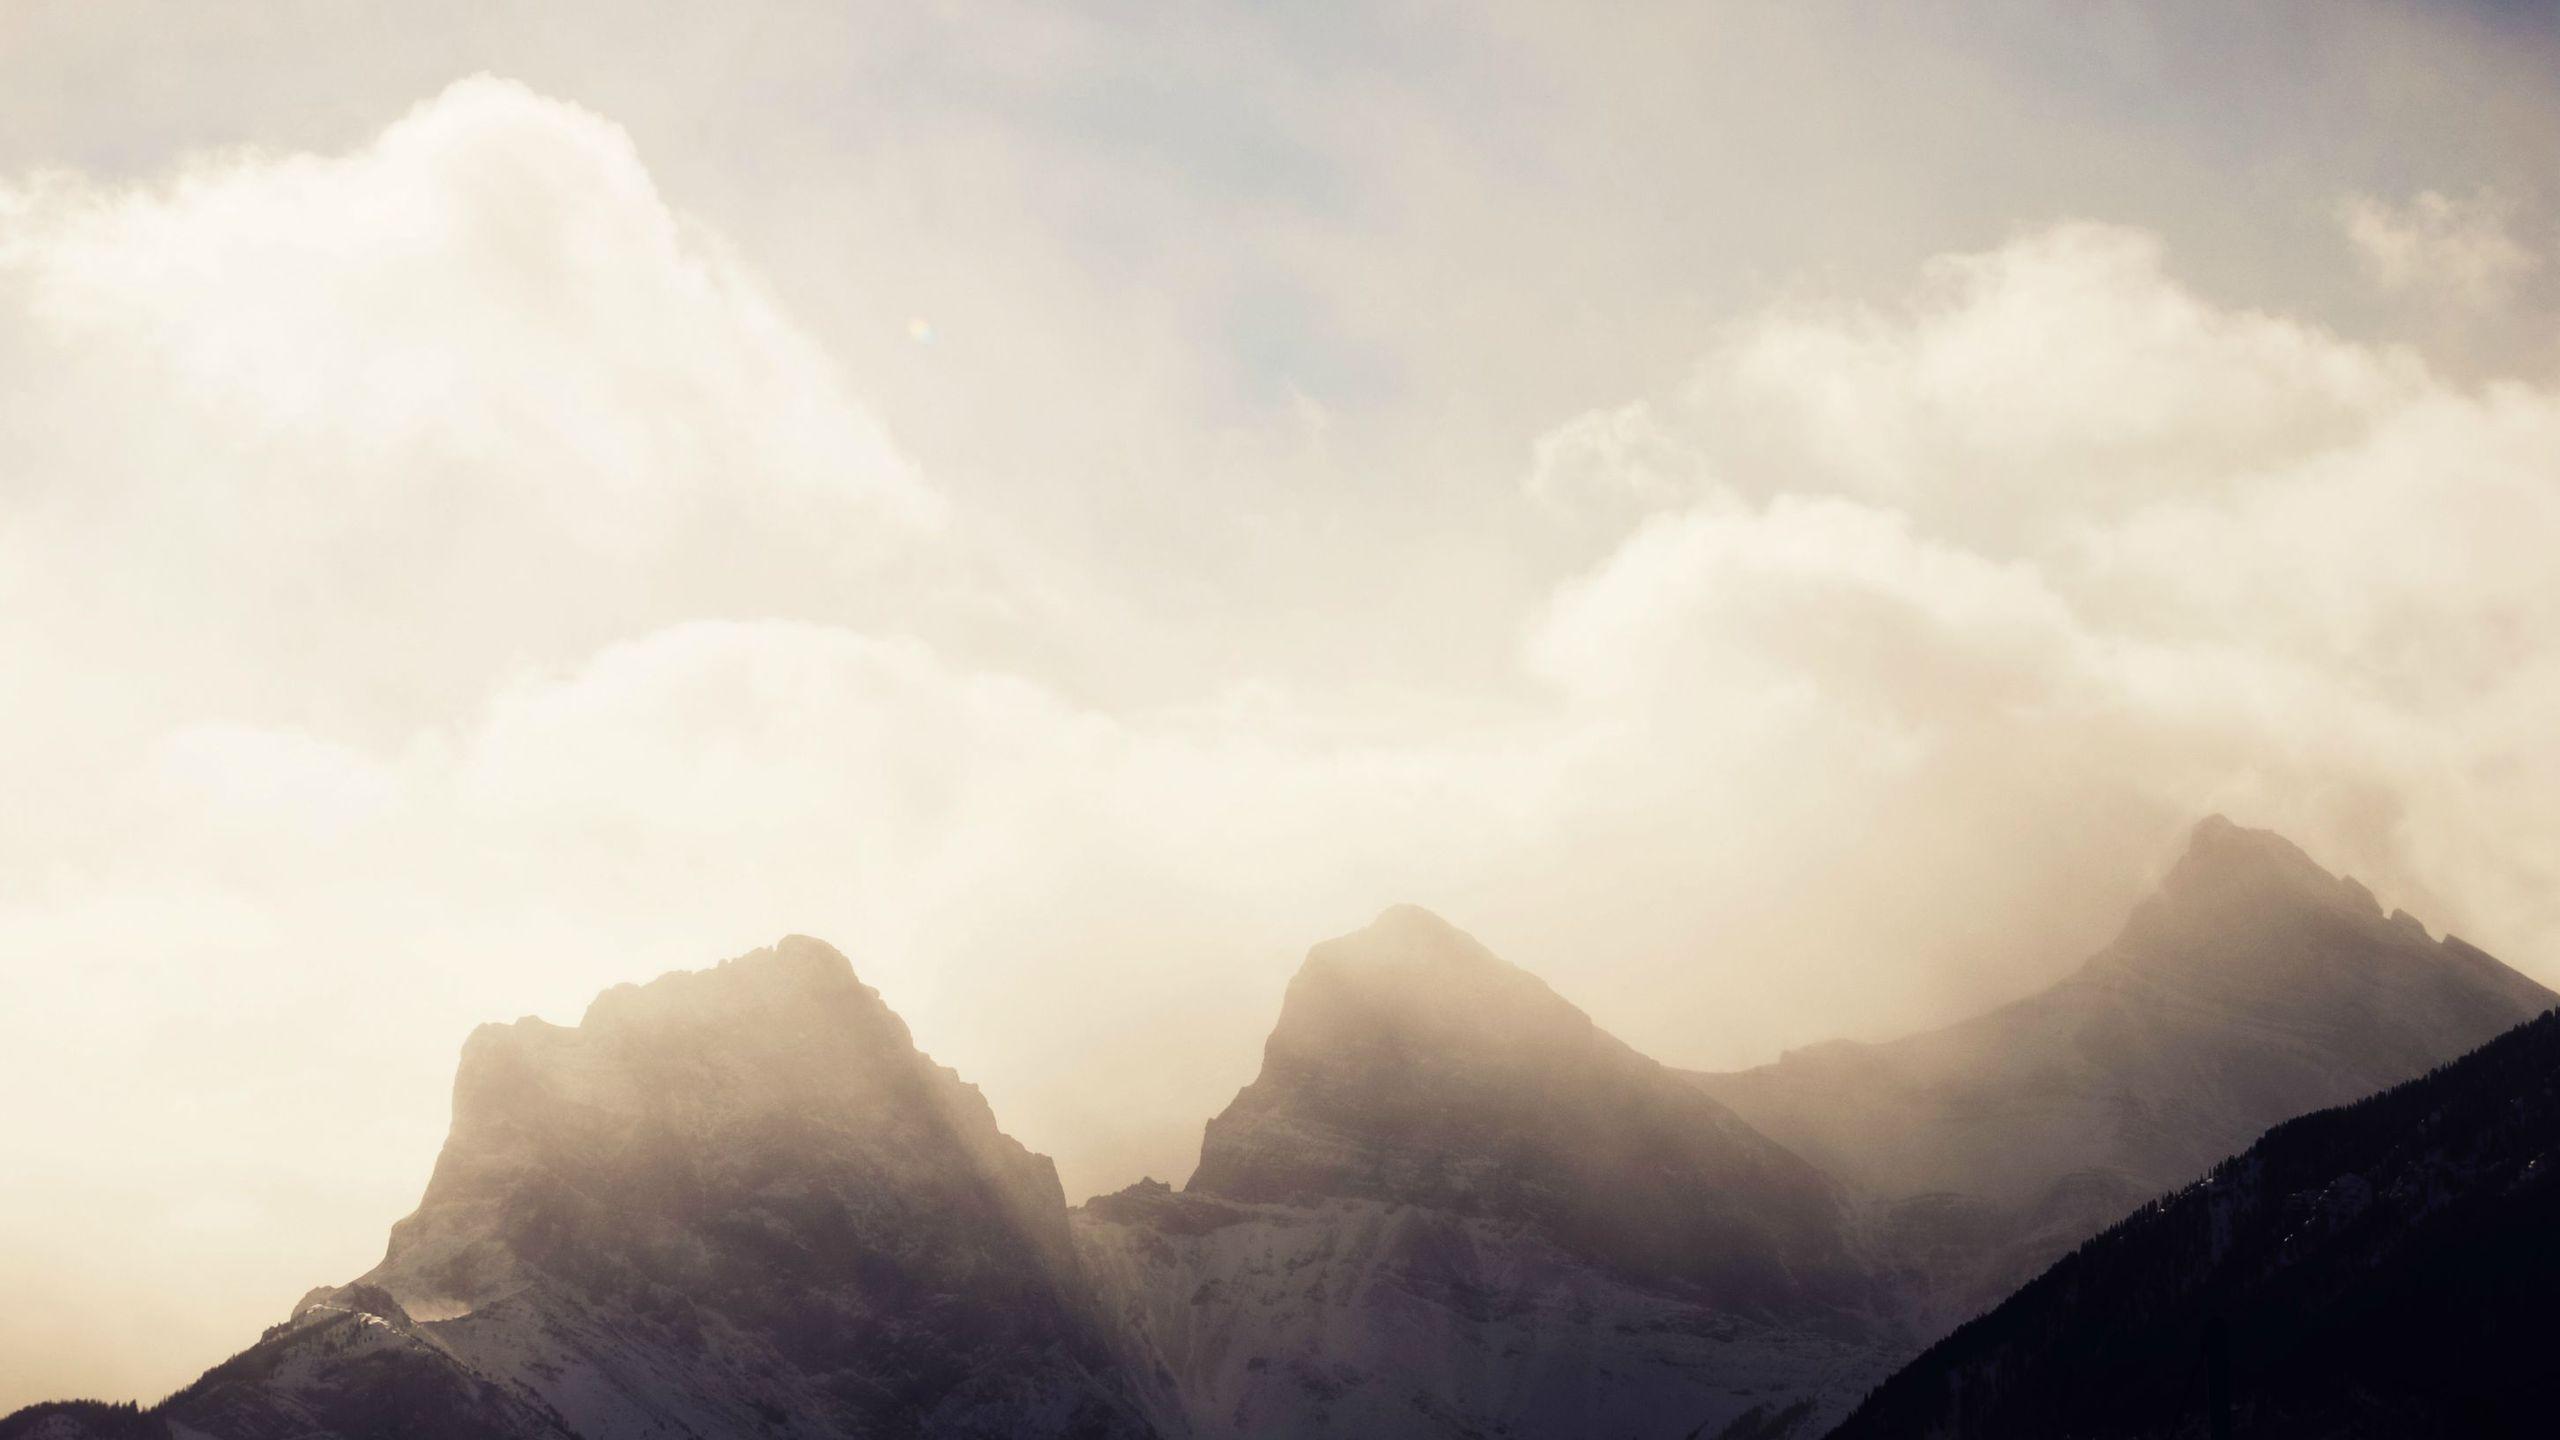 BOTPOST] Three Sisters Canmore Canada iimgurcom 2560x1440